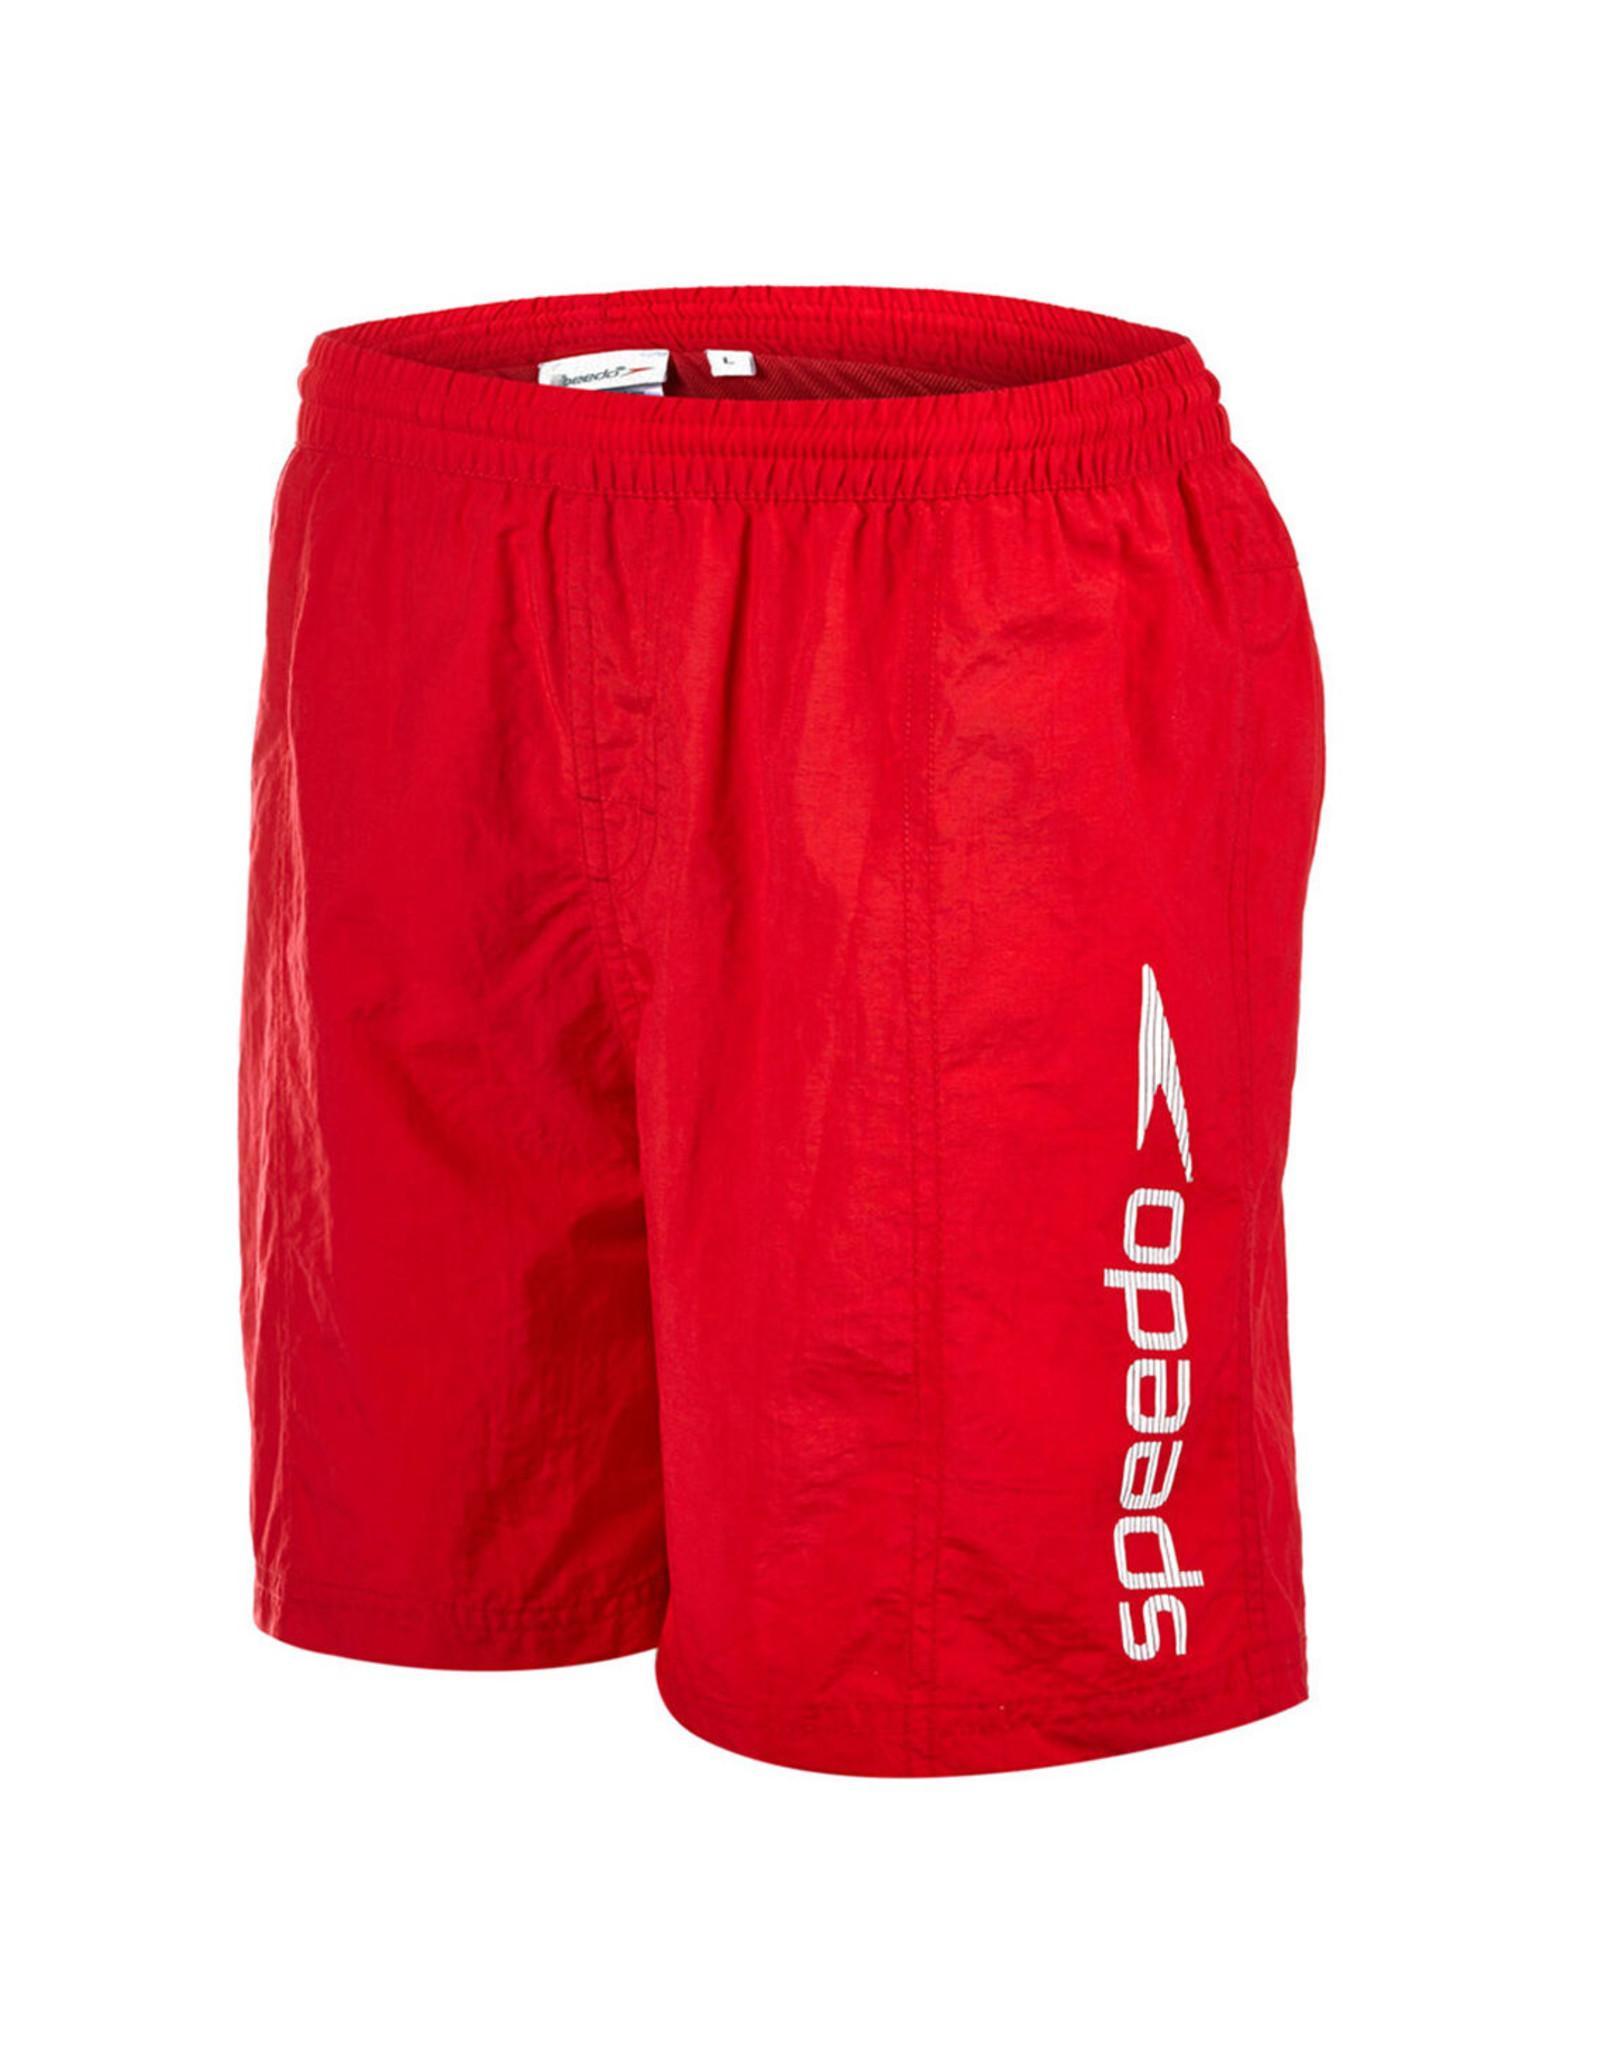 Speedo Boys Shorts Challenge 15 JR